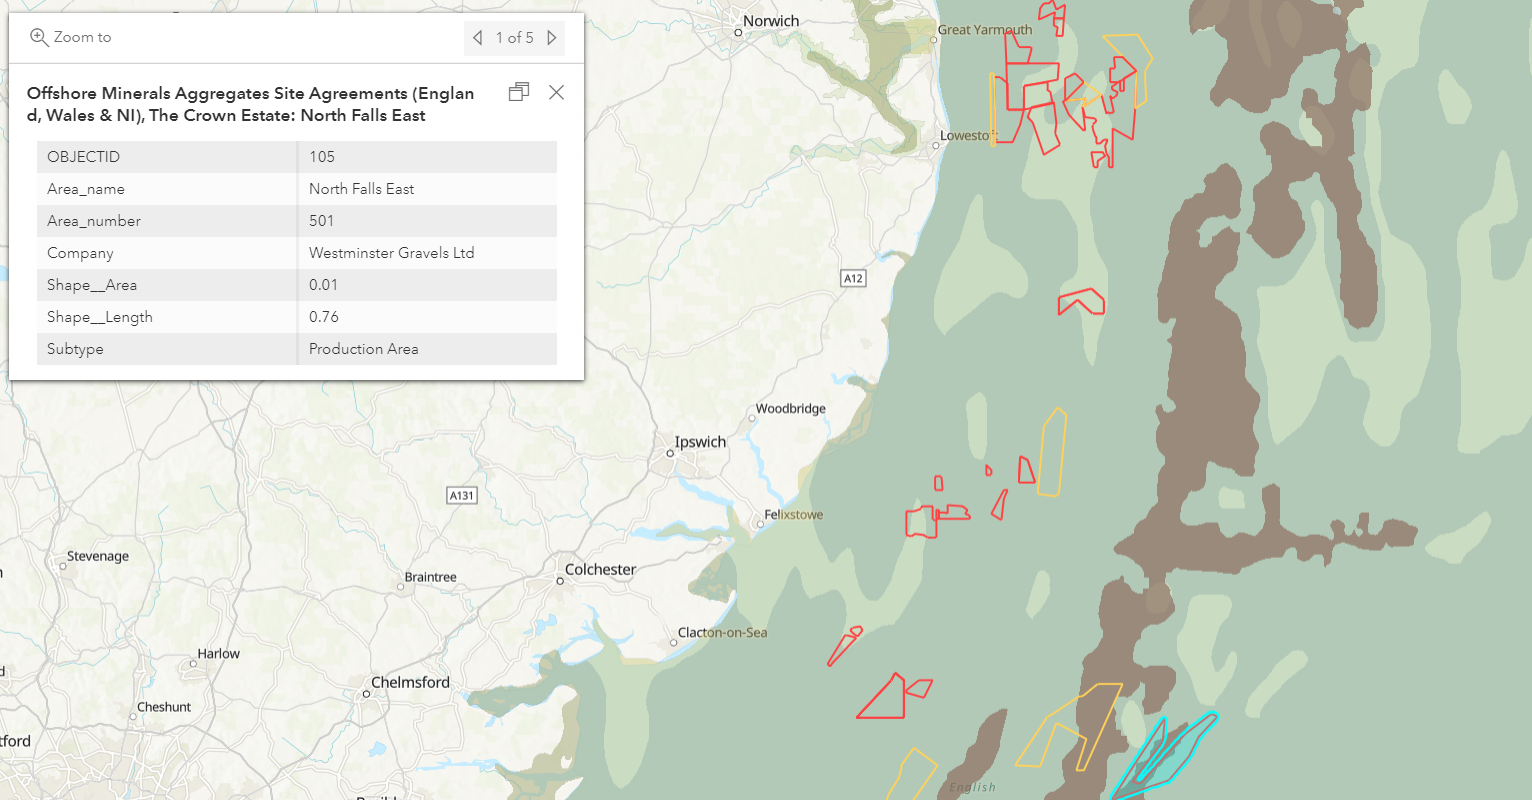 Seafloor geomorphology and licensed areas